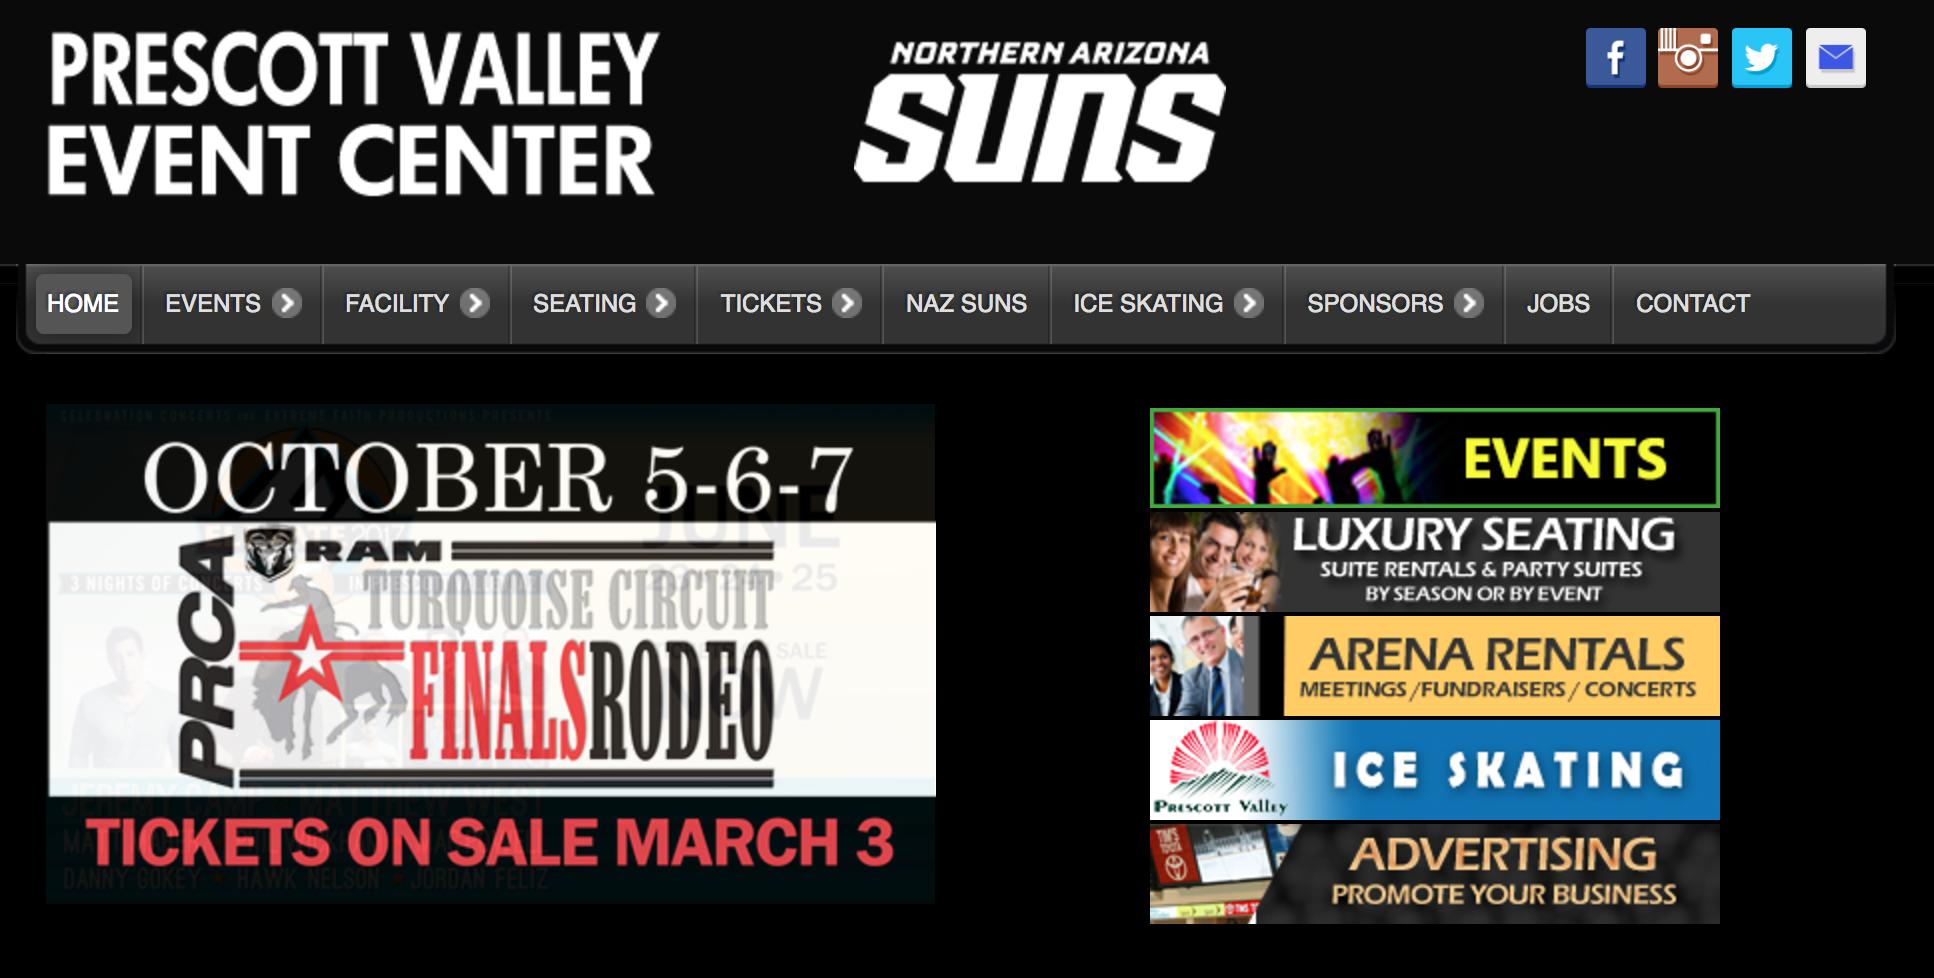 Prescott Valley Events Center